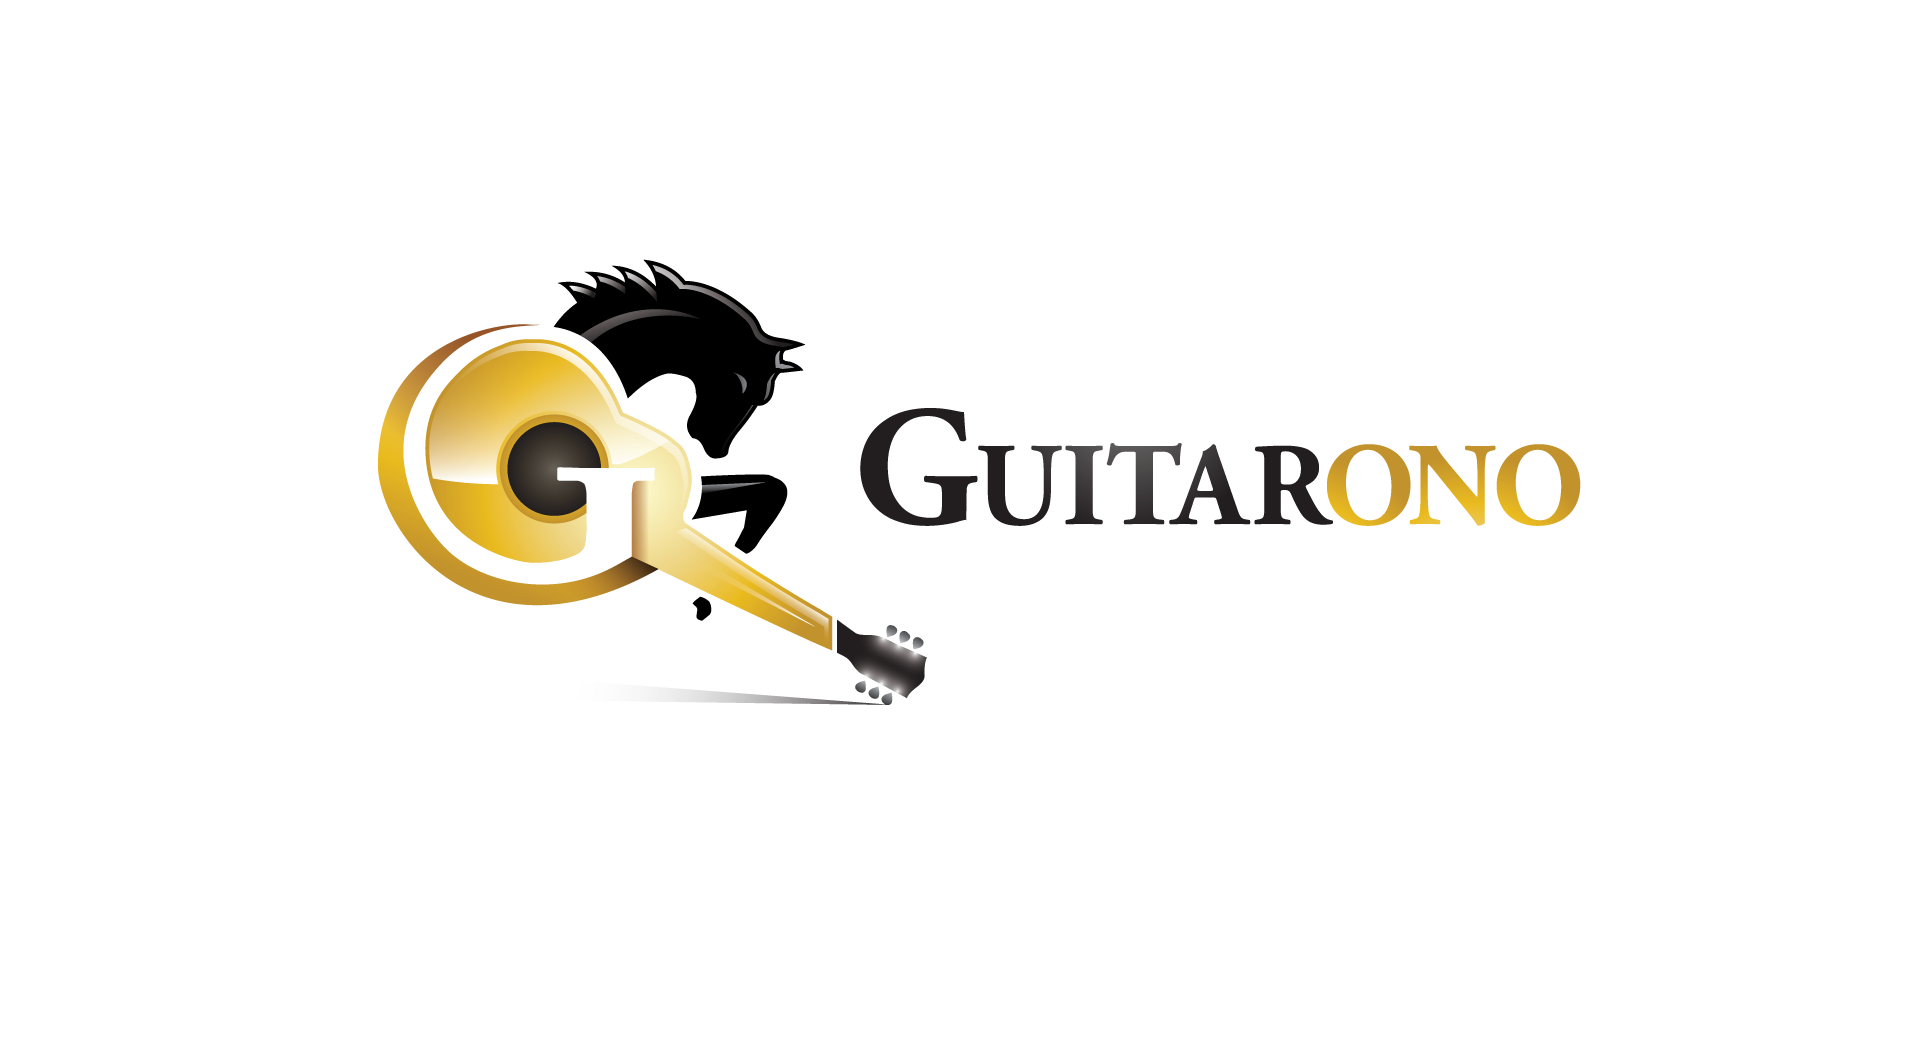 Guitarono - Audio startup name for sale